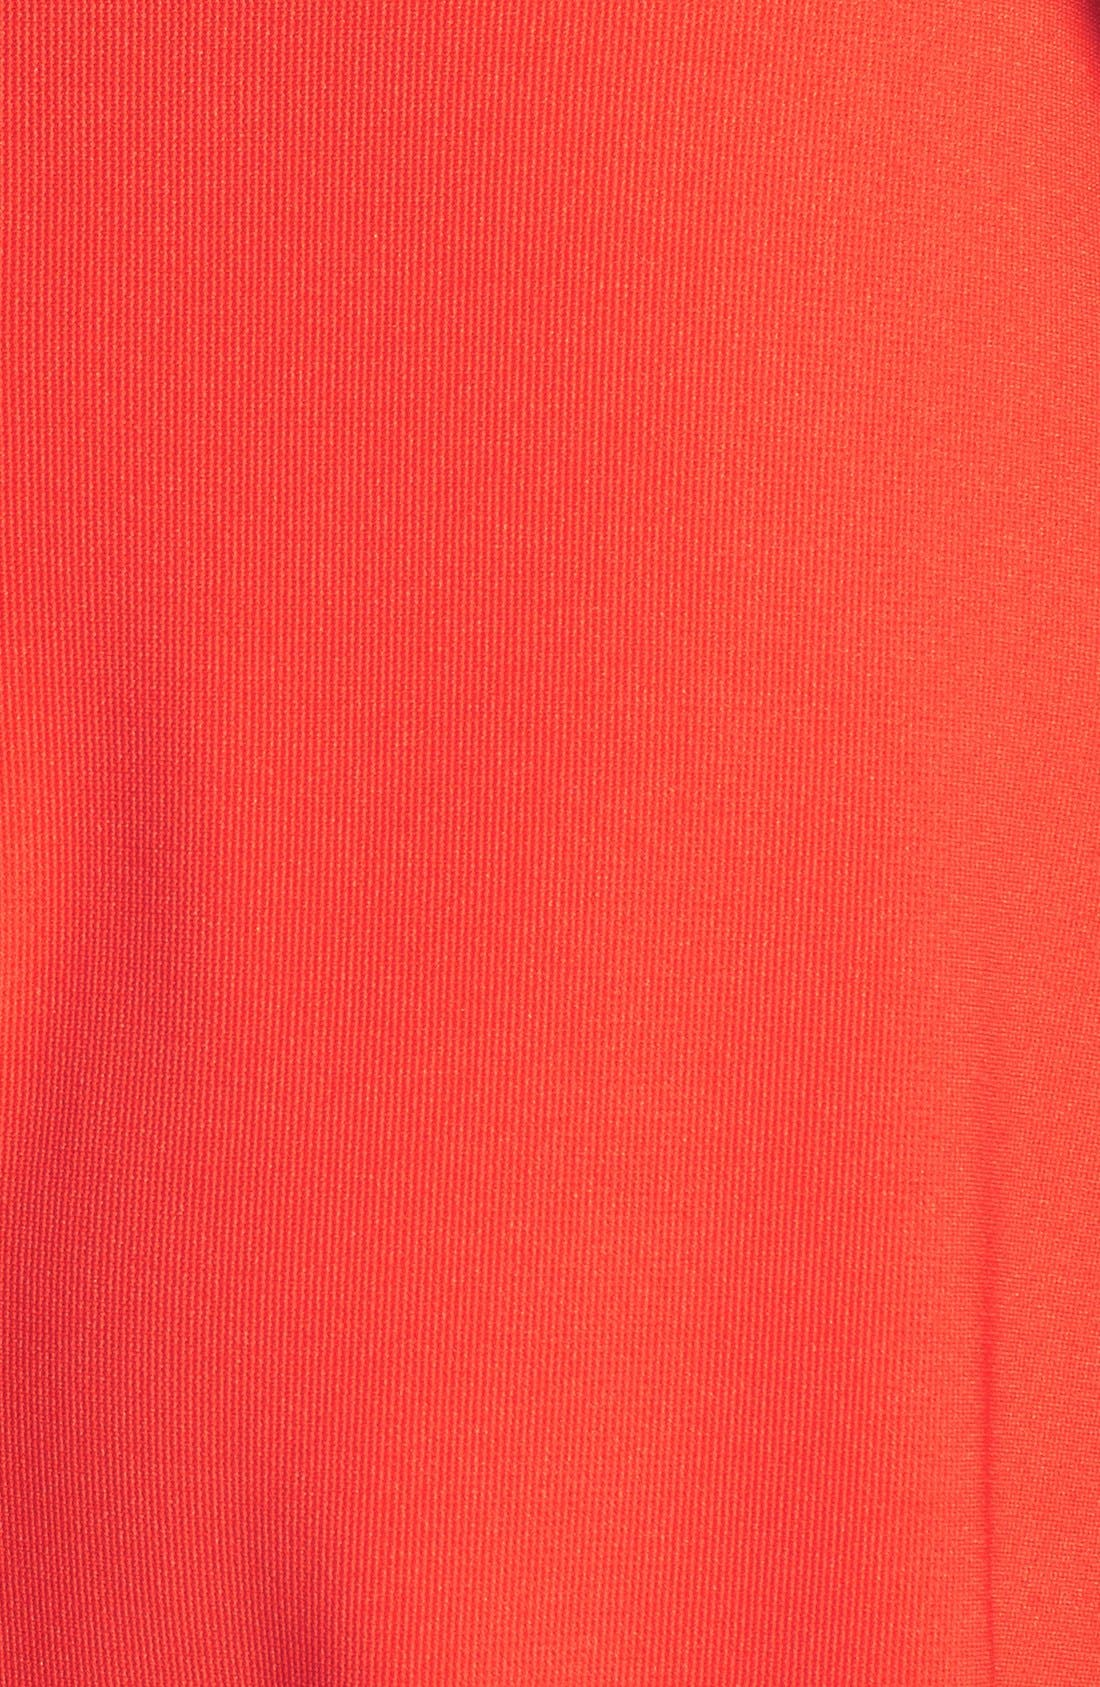 Alternate Image 3  - Lush Strapless Bustier Stretch Knit Dress (Juniors)